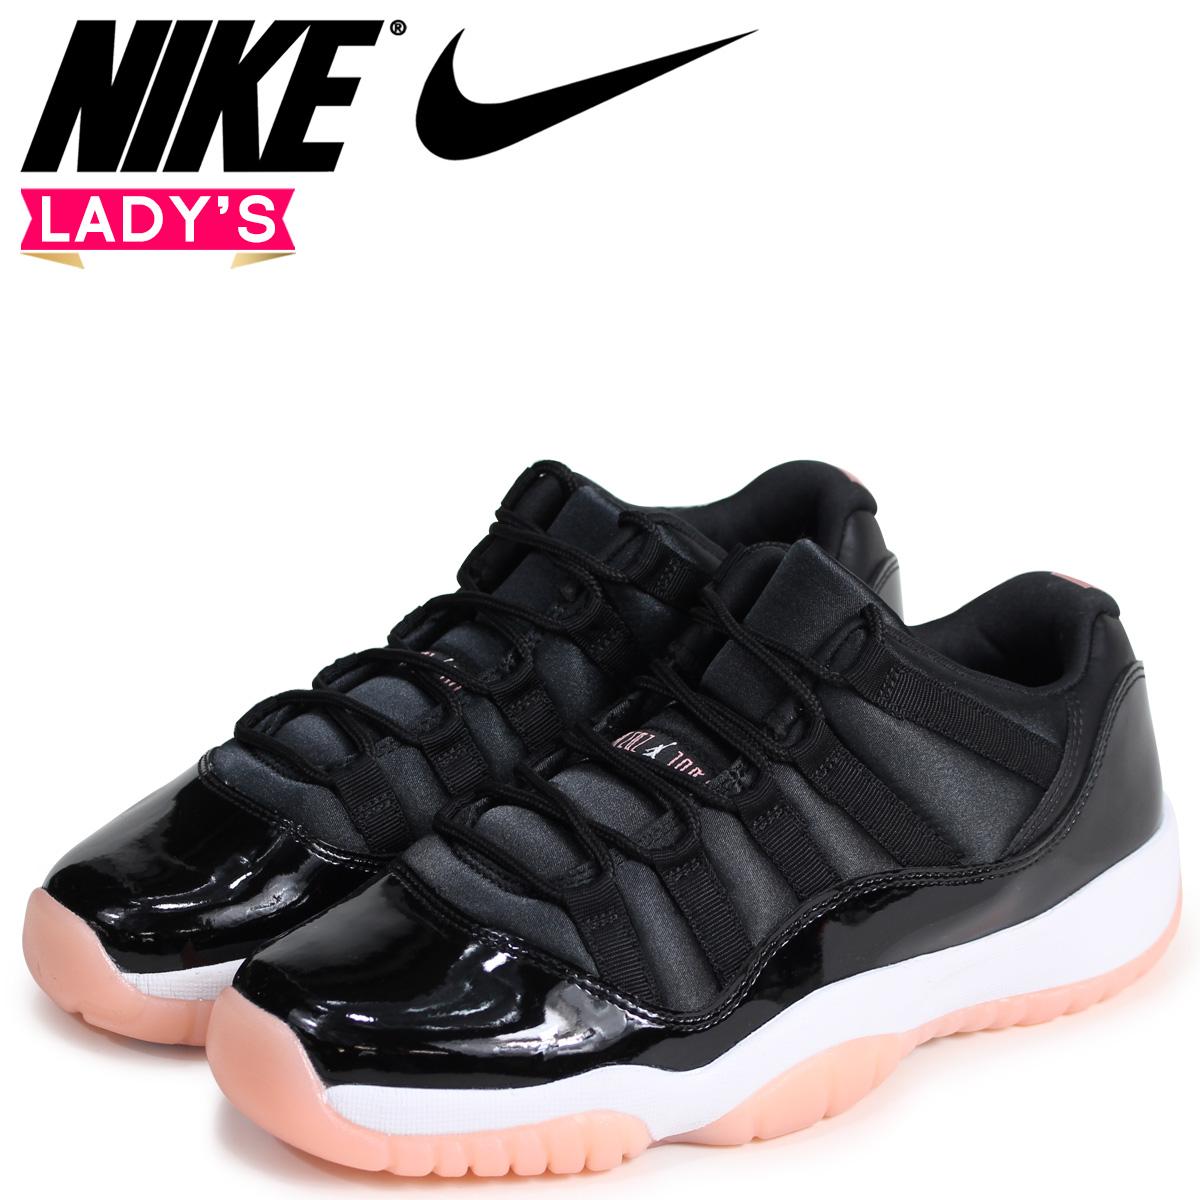 7610040a6fec NIKE Nike Air Jordan 11 Lady s sneakers AIR JORDAN 11 RETRO LOW GG 580